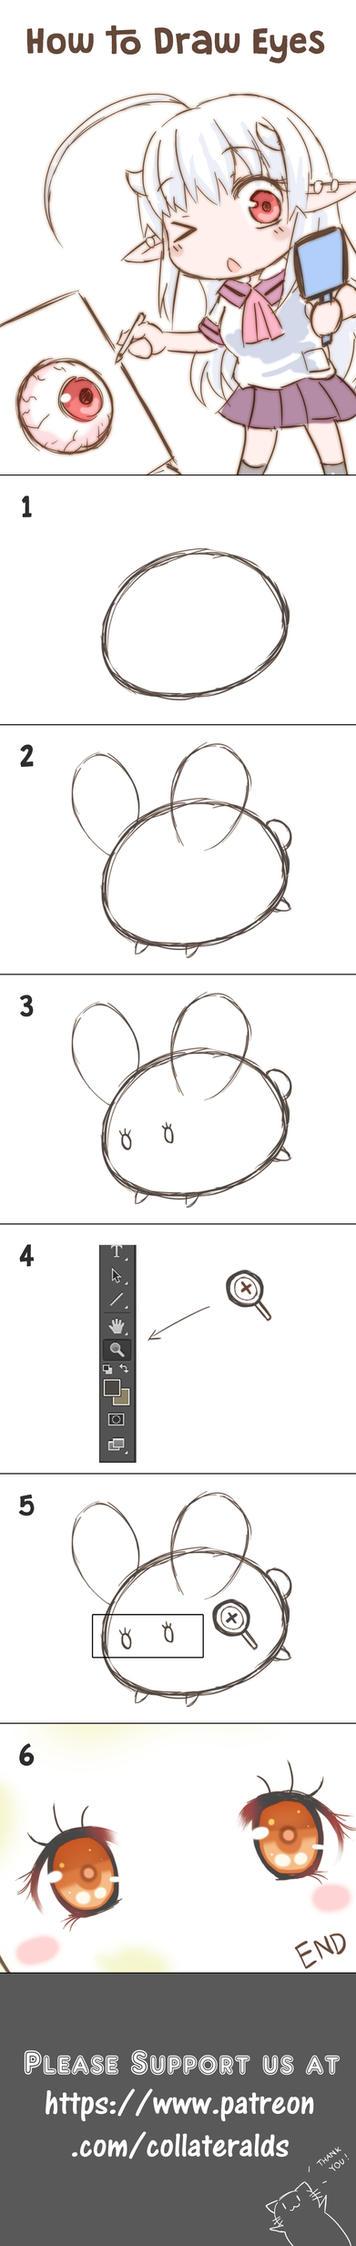 How to draw eyes DA by GreenTeaNeko